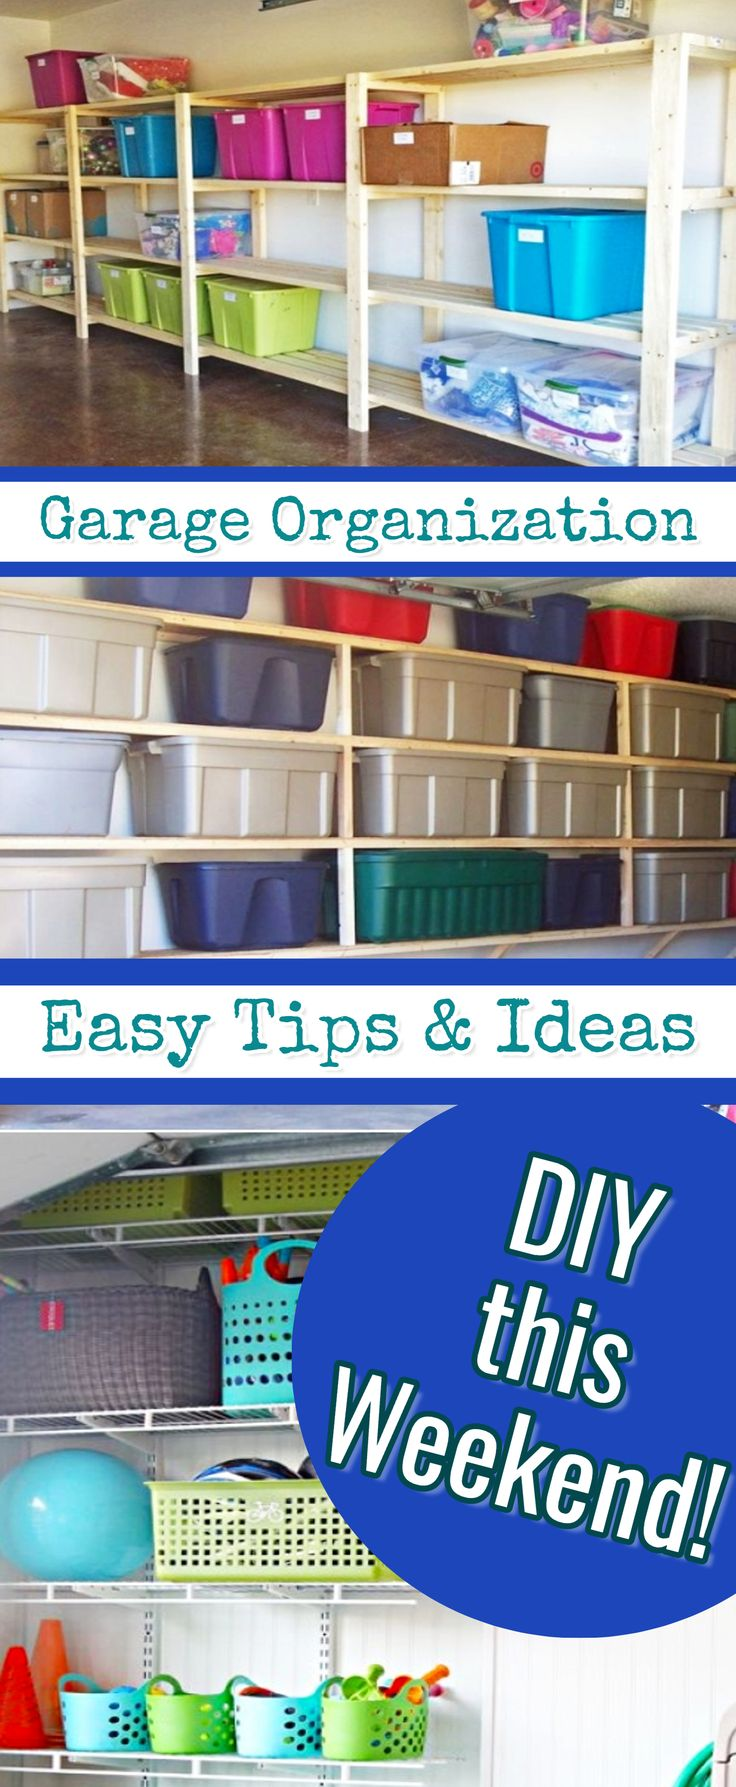 Garage Organization - Easy Tips & Ideas  - quick, cheap, and clever garage organizing ideas we love #garageorganization #garage #getorganized